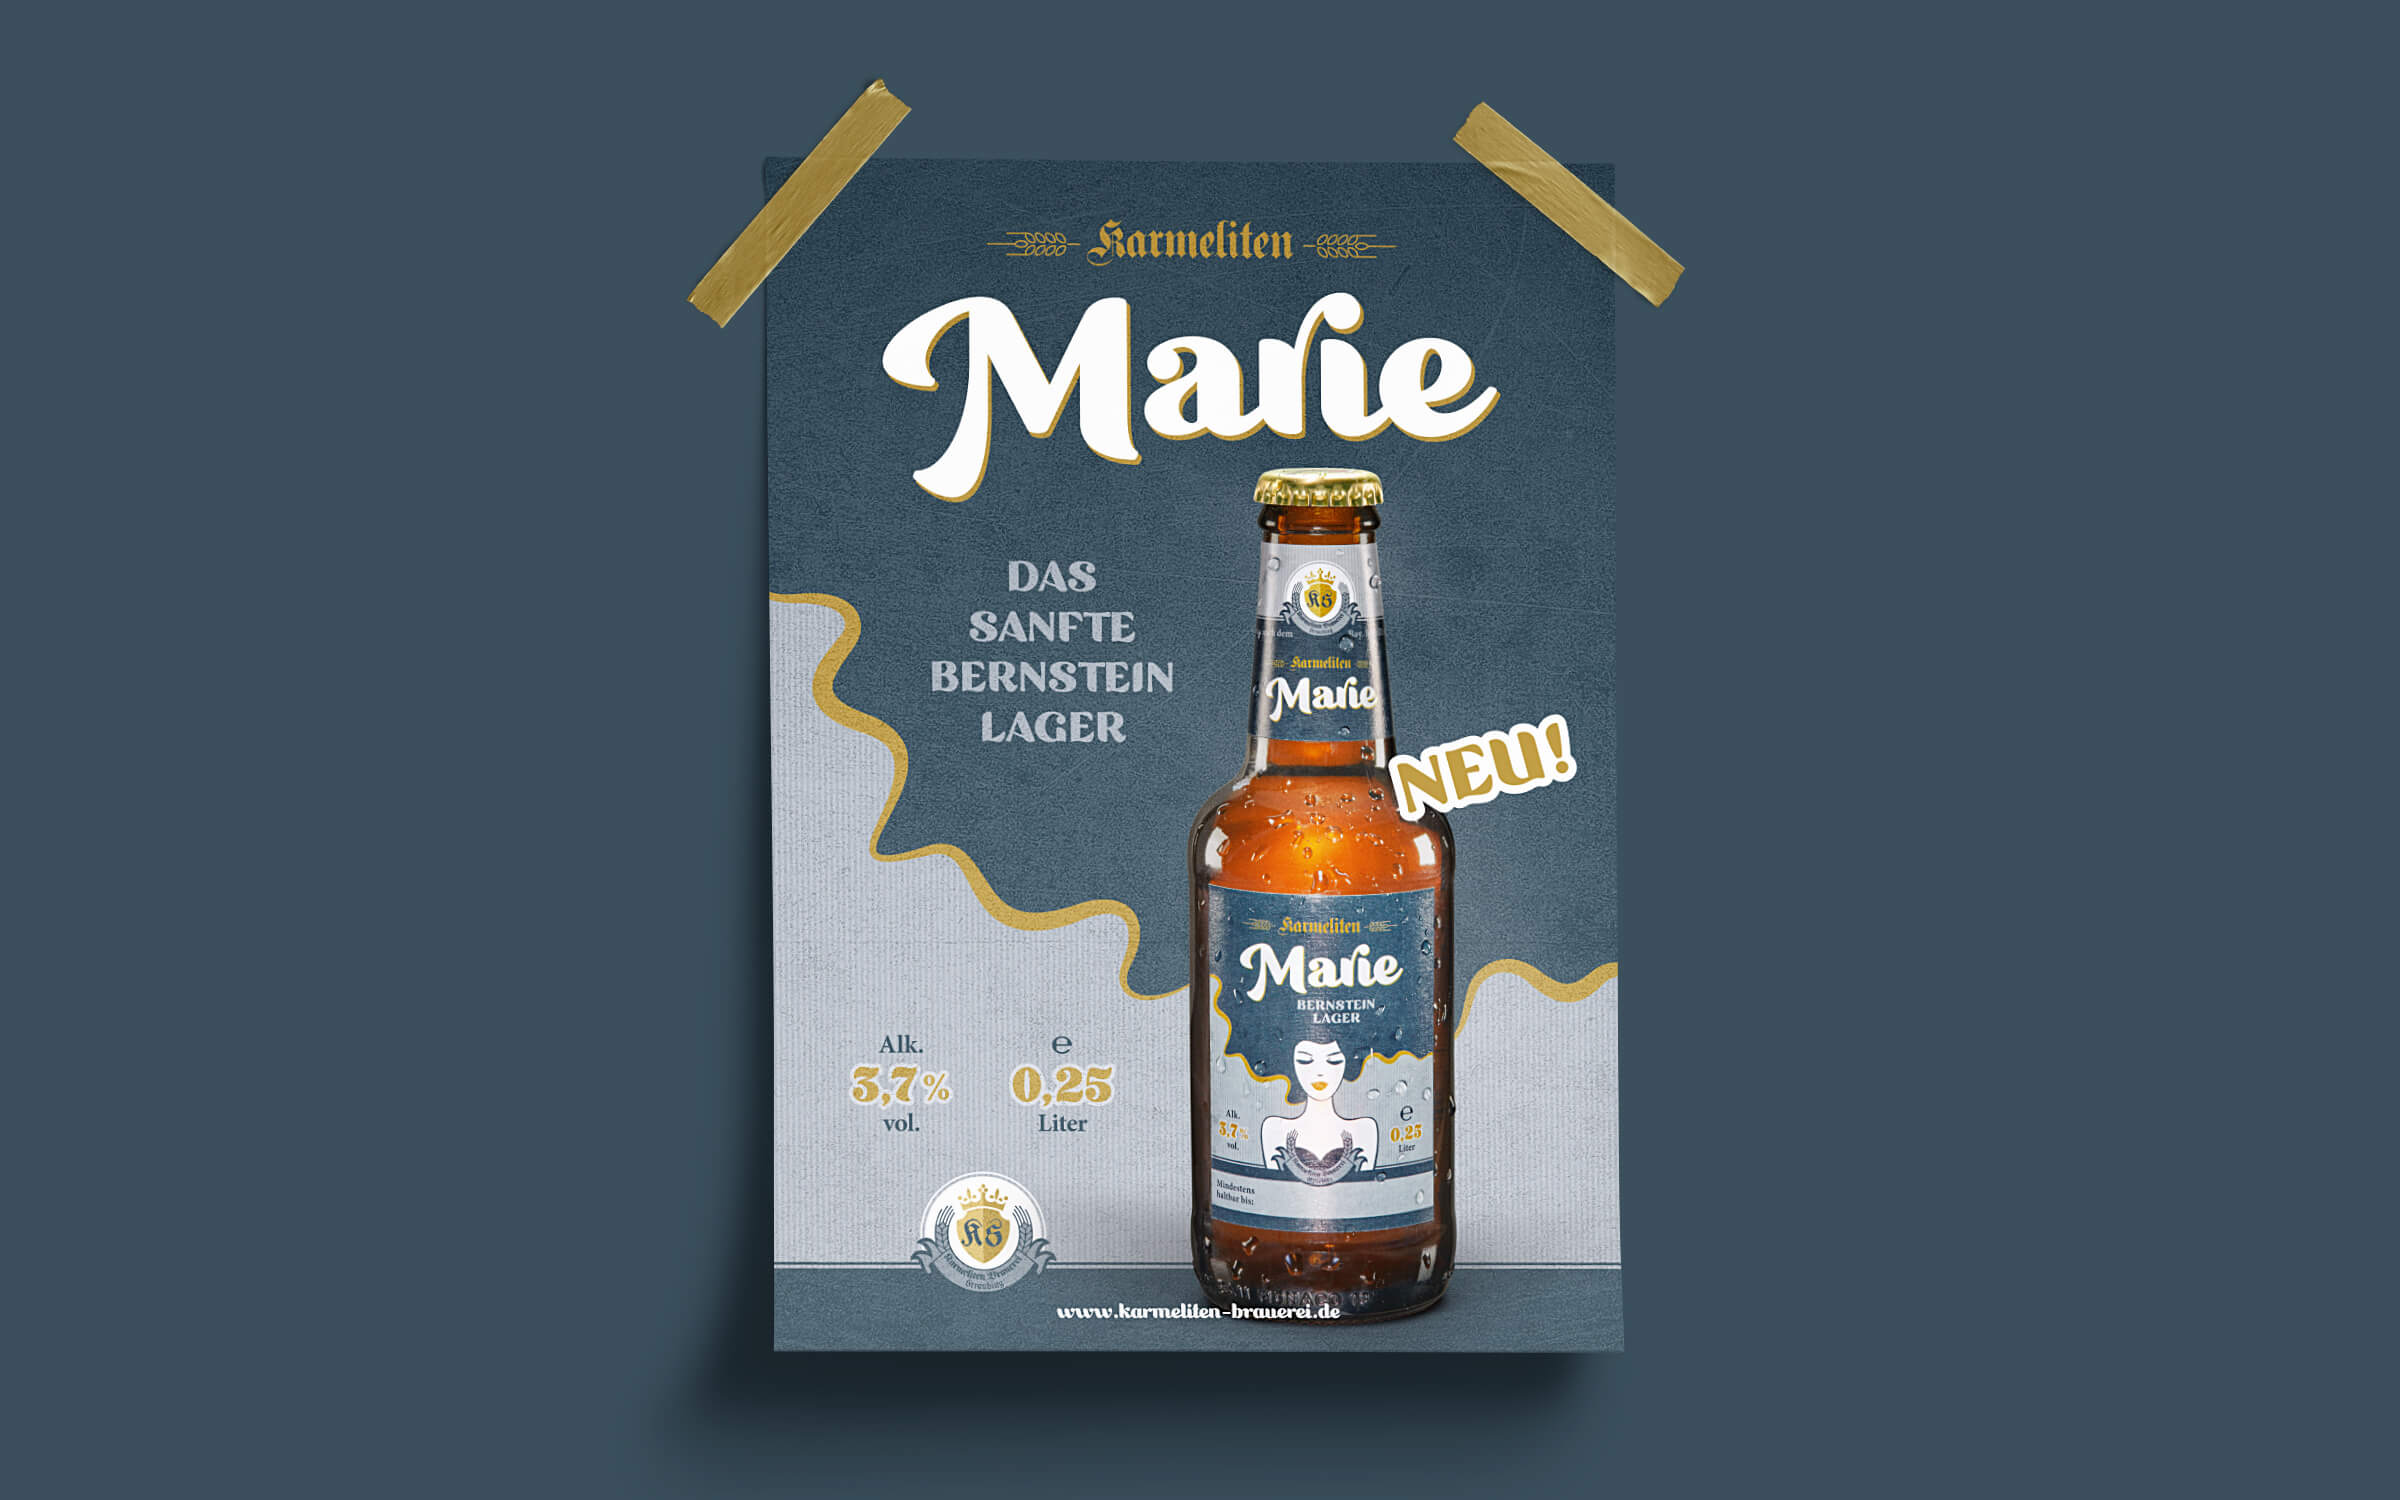 Karmeliten Brauerei – Marie Poster